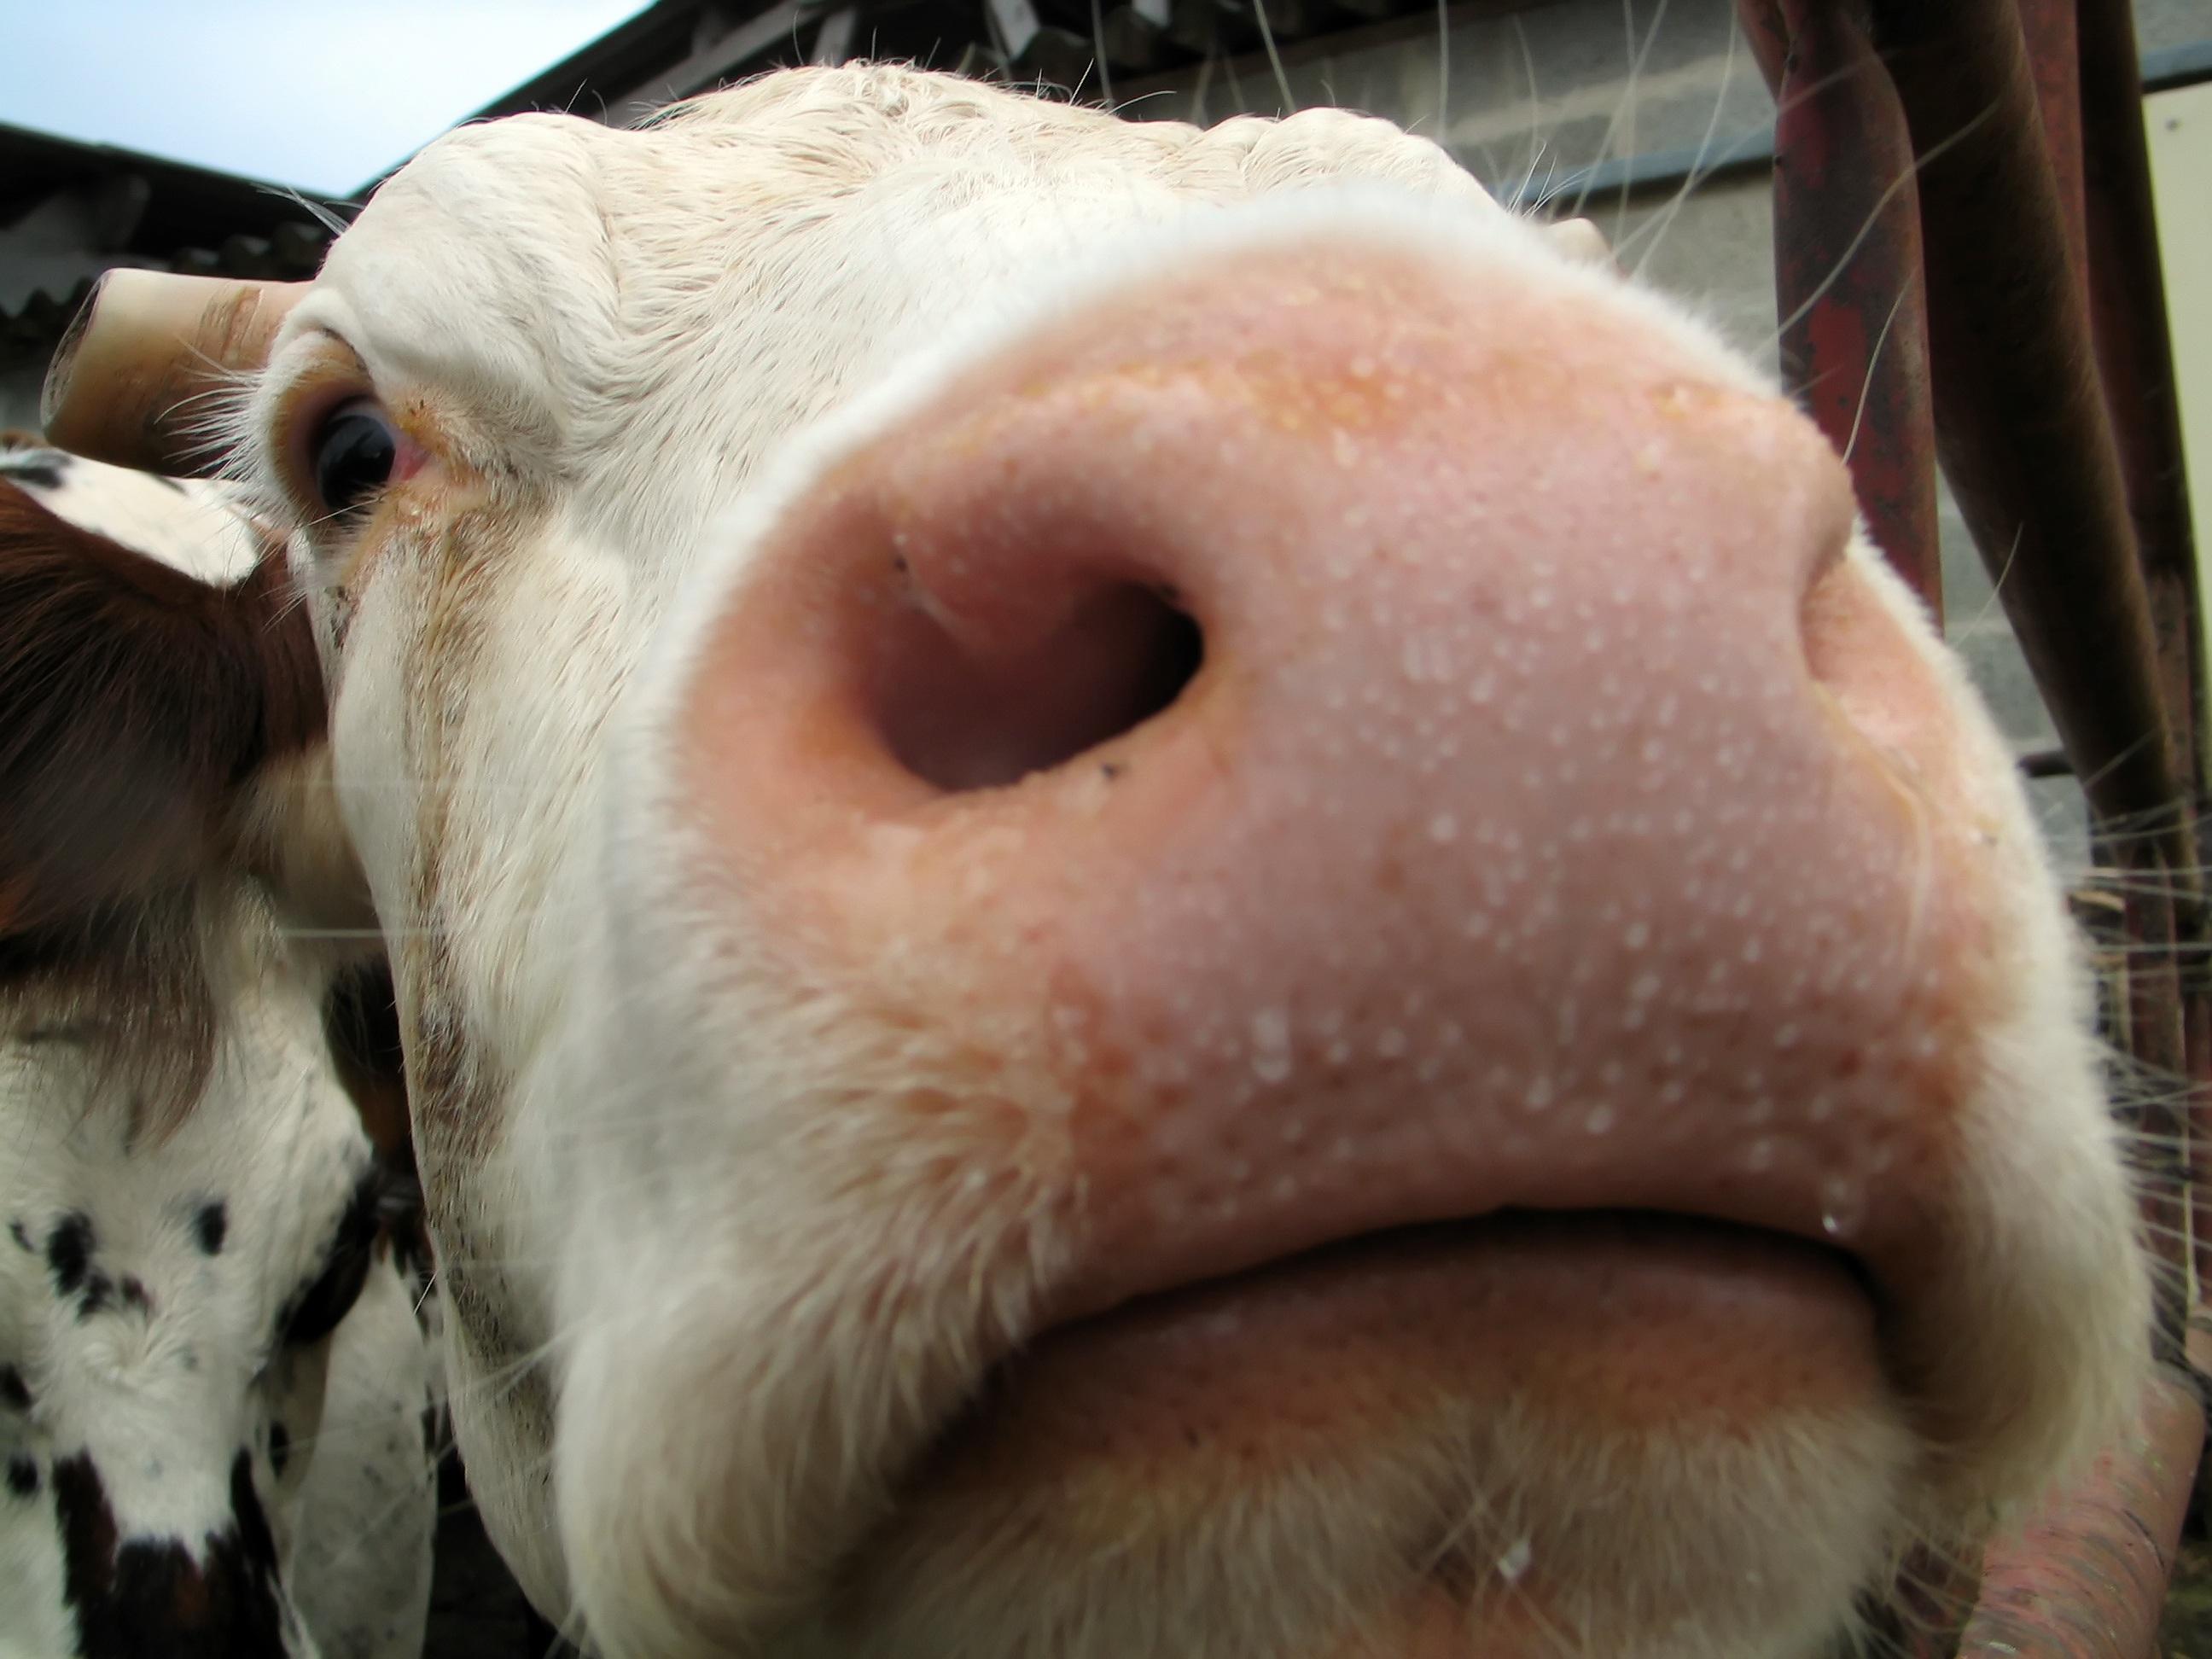 Selfie, Animal, Caption, Cow, Farm, HQ Photo